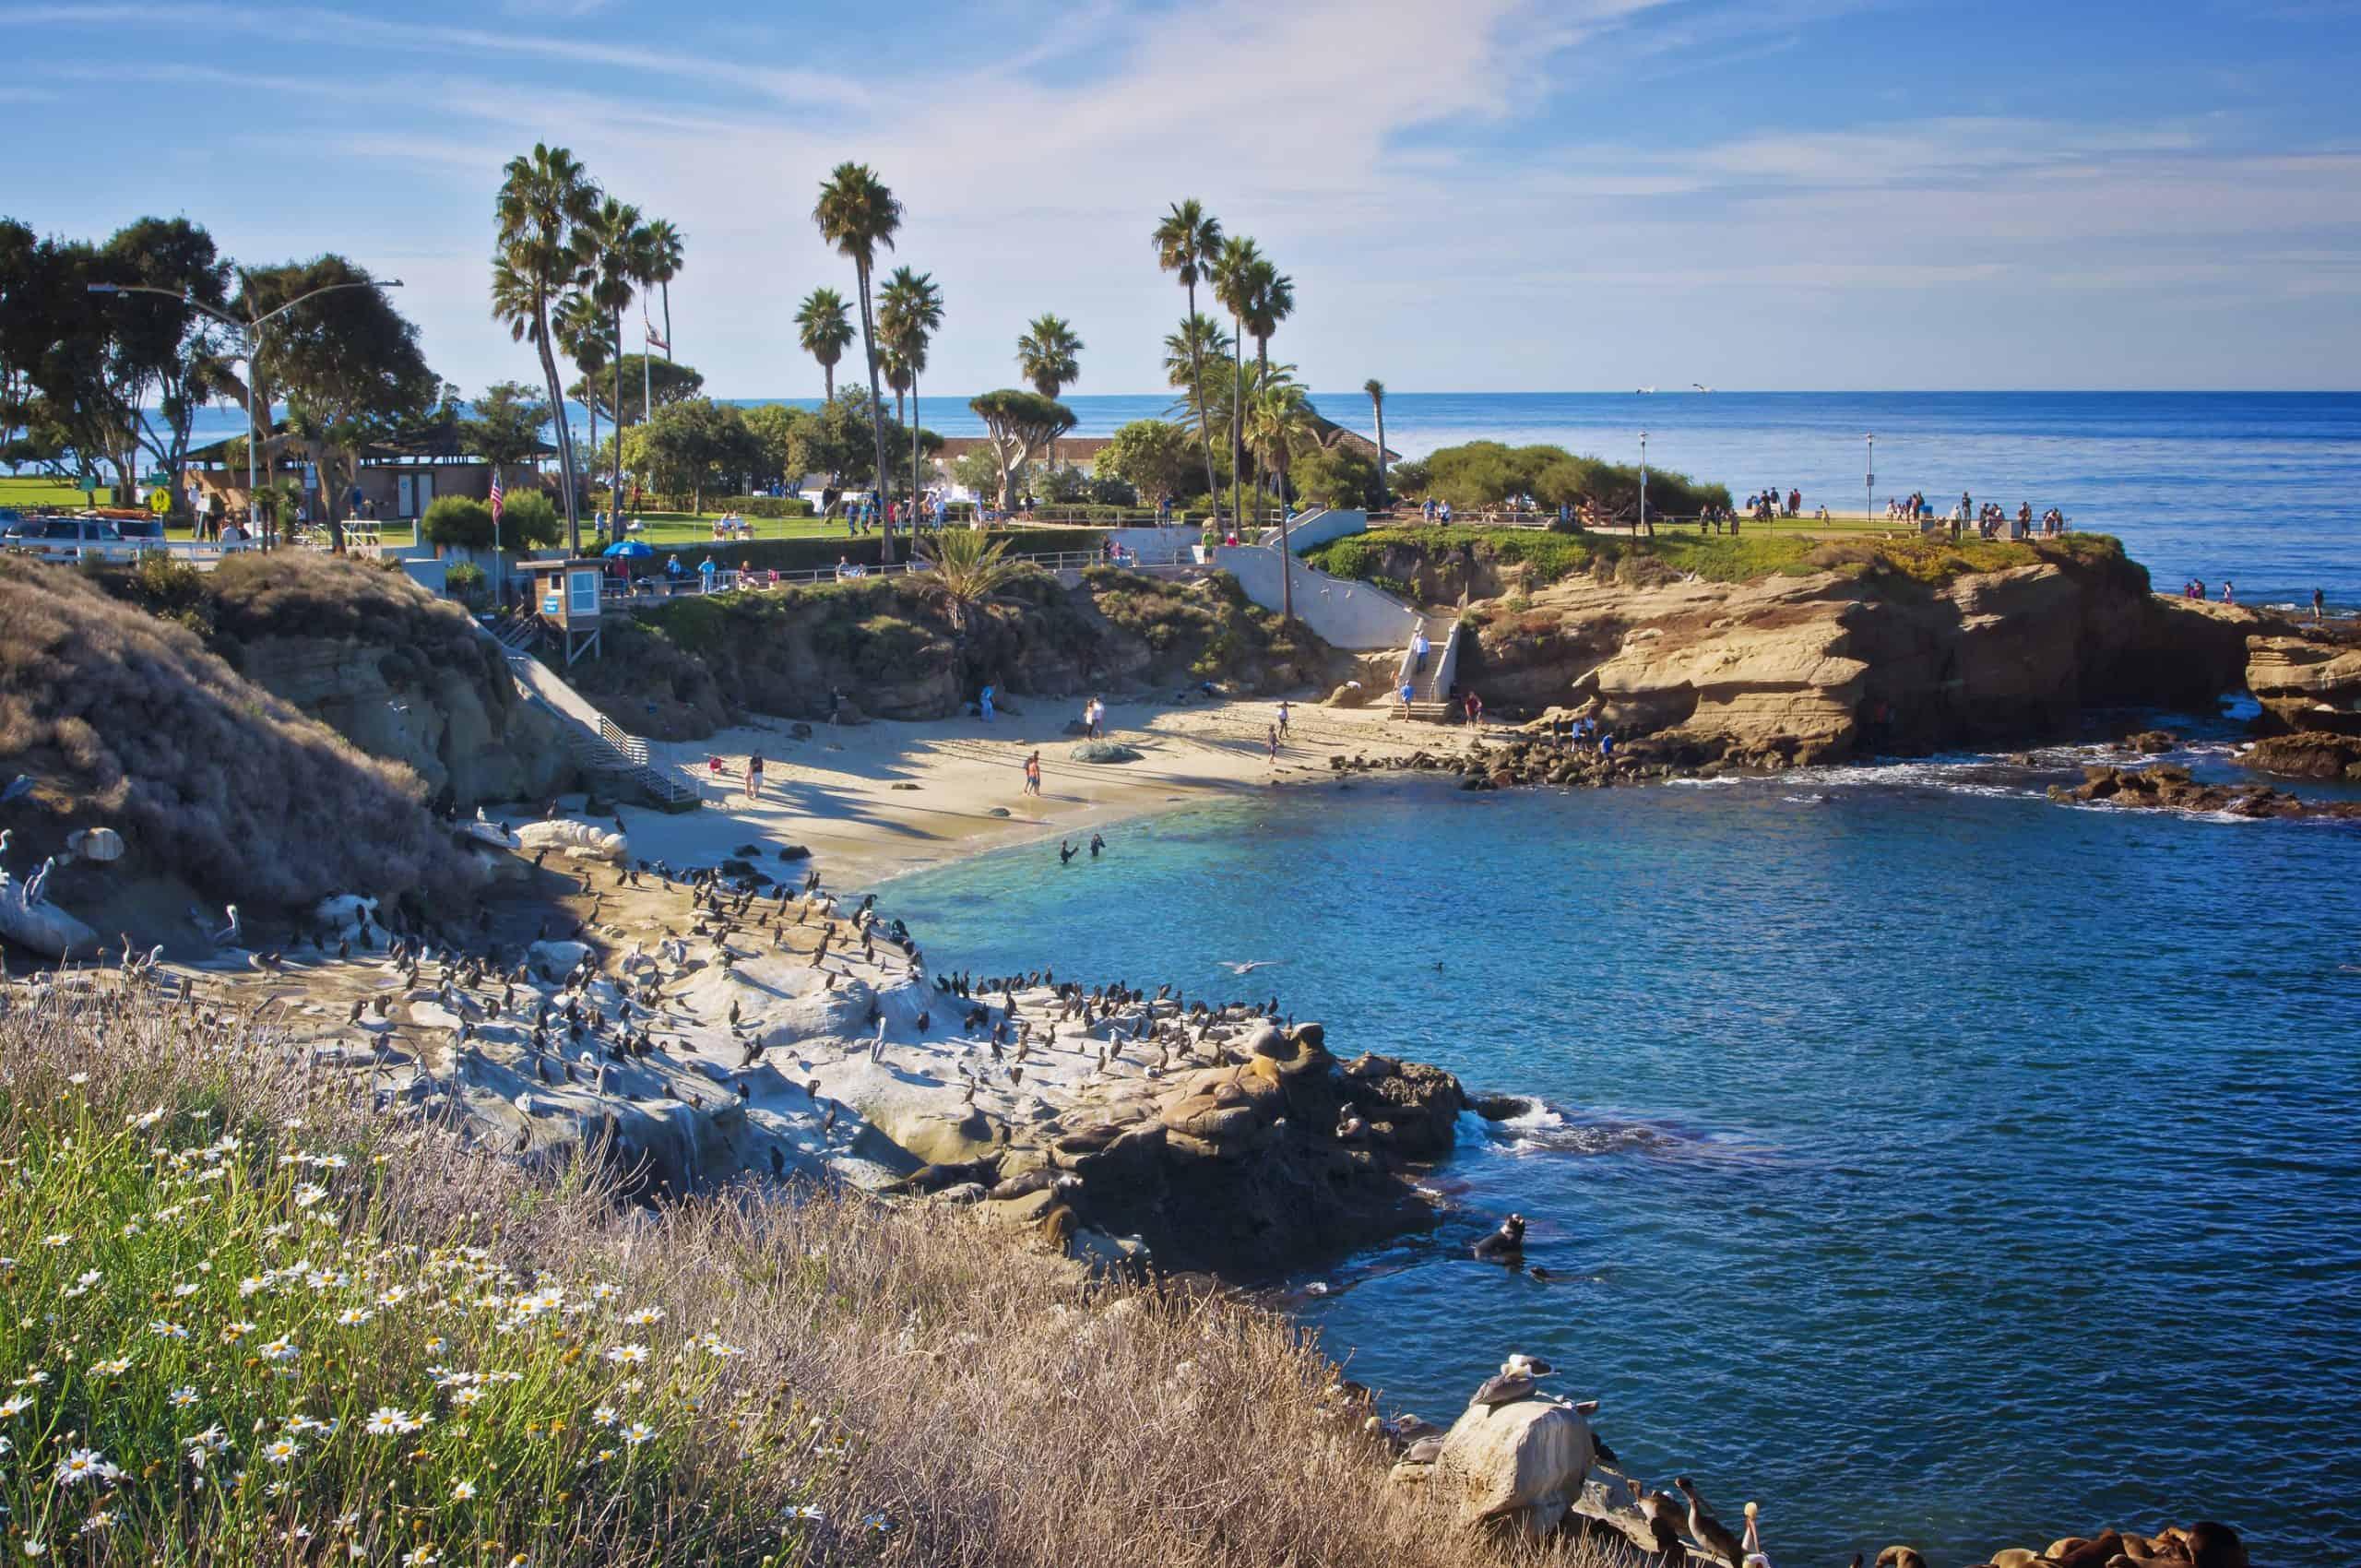 Blue waters of La Jolla Cove Beach in Southern California.